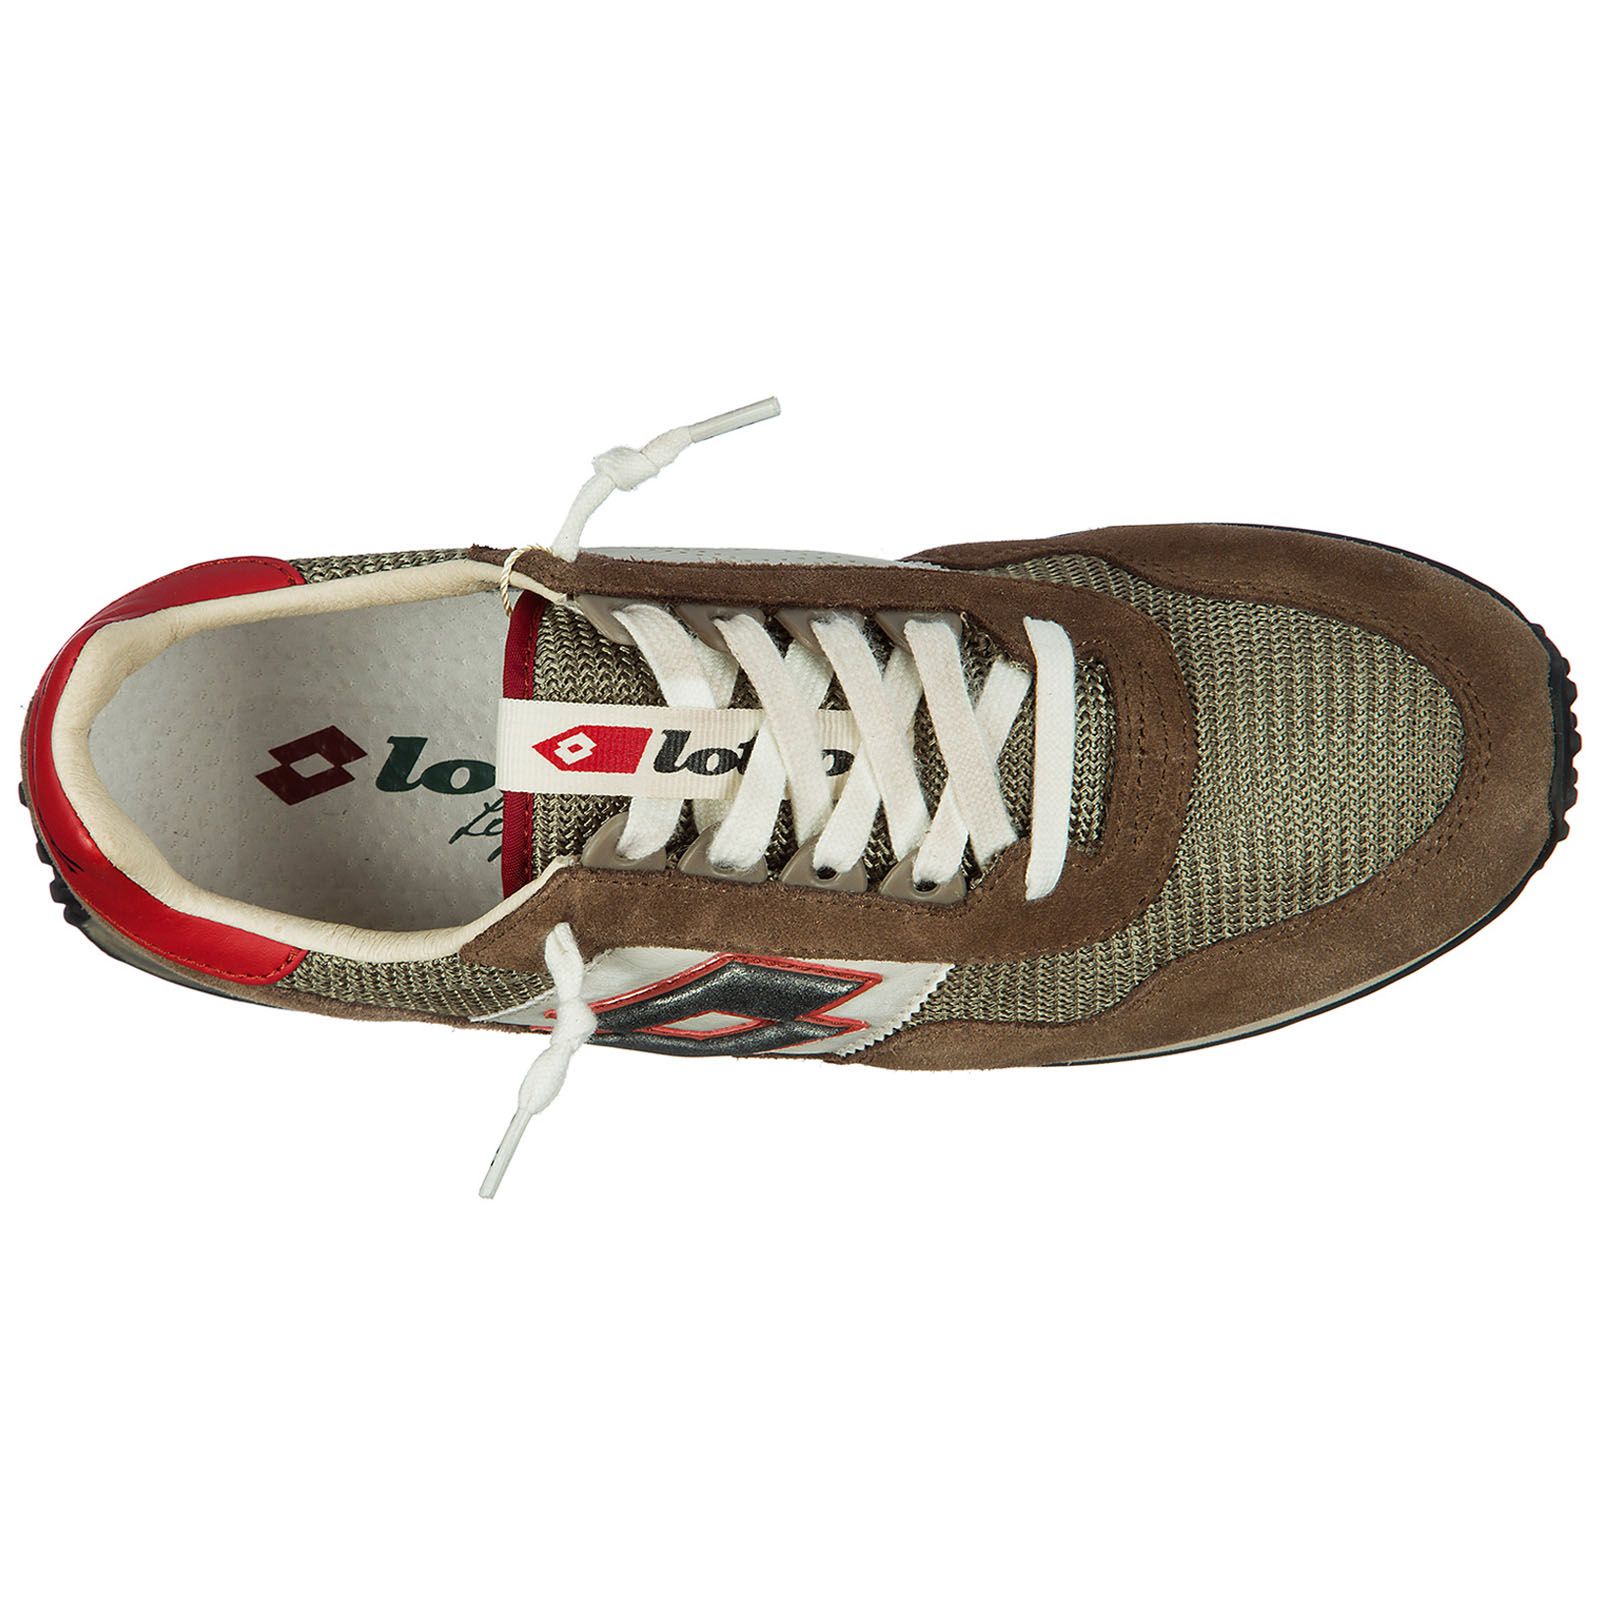 ... Men s shoes suede trainers sneakers tokyo targa ... c6bdb7e13ce